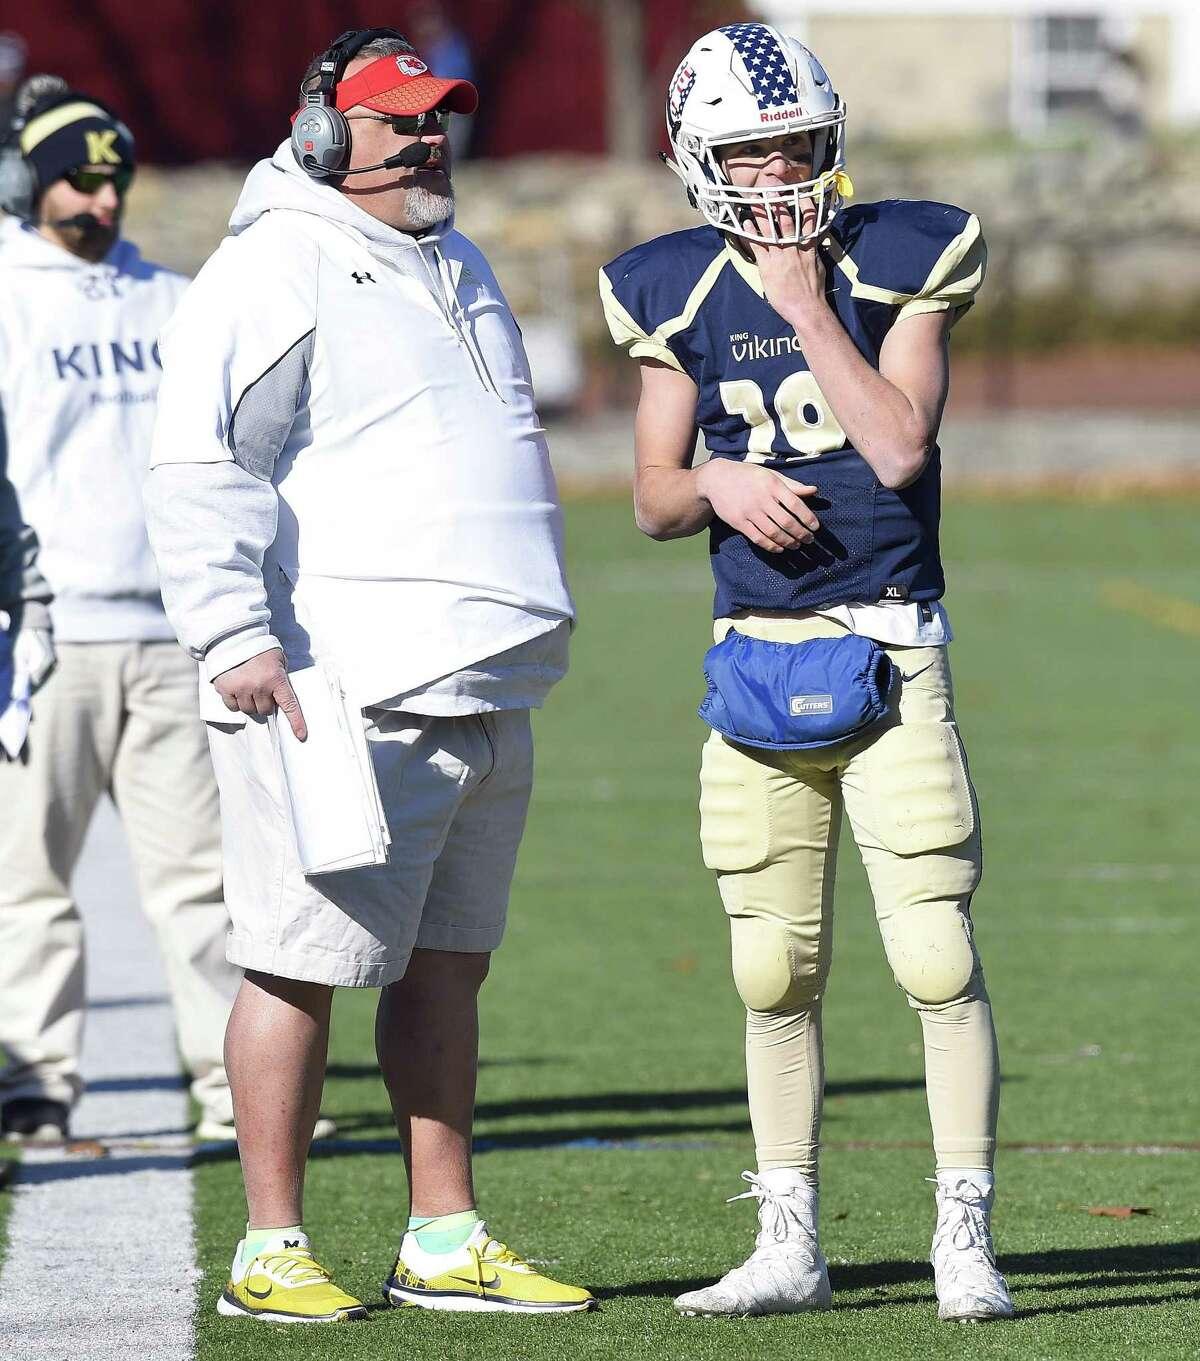 King coach Dan Gouin talks with quarterback Renn Lints (19) in a FAA regular season football final against St. Lukes in Stamford, Connecticut on Saturday, Nov. 11, 2017. King defeated St. Lukes 42-13.